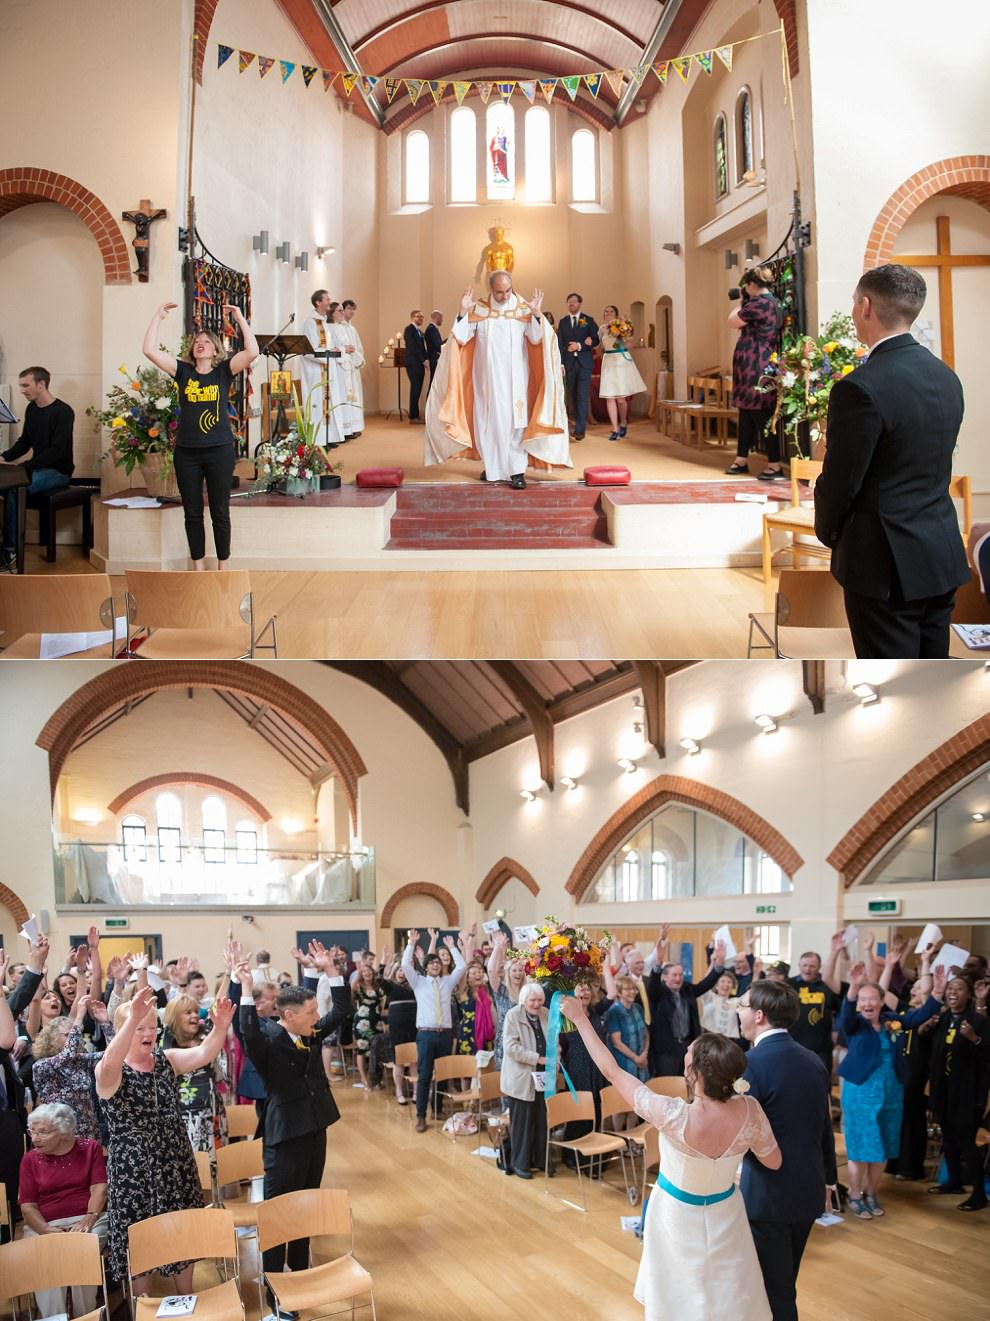 Wedding exit |  South East England wedding photographers